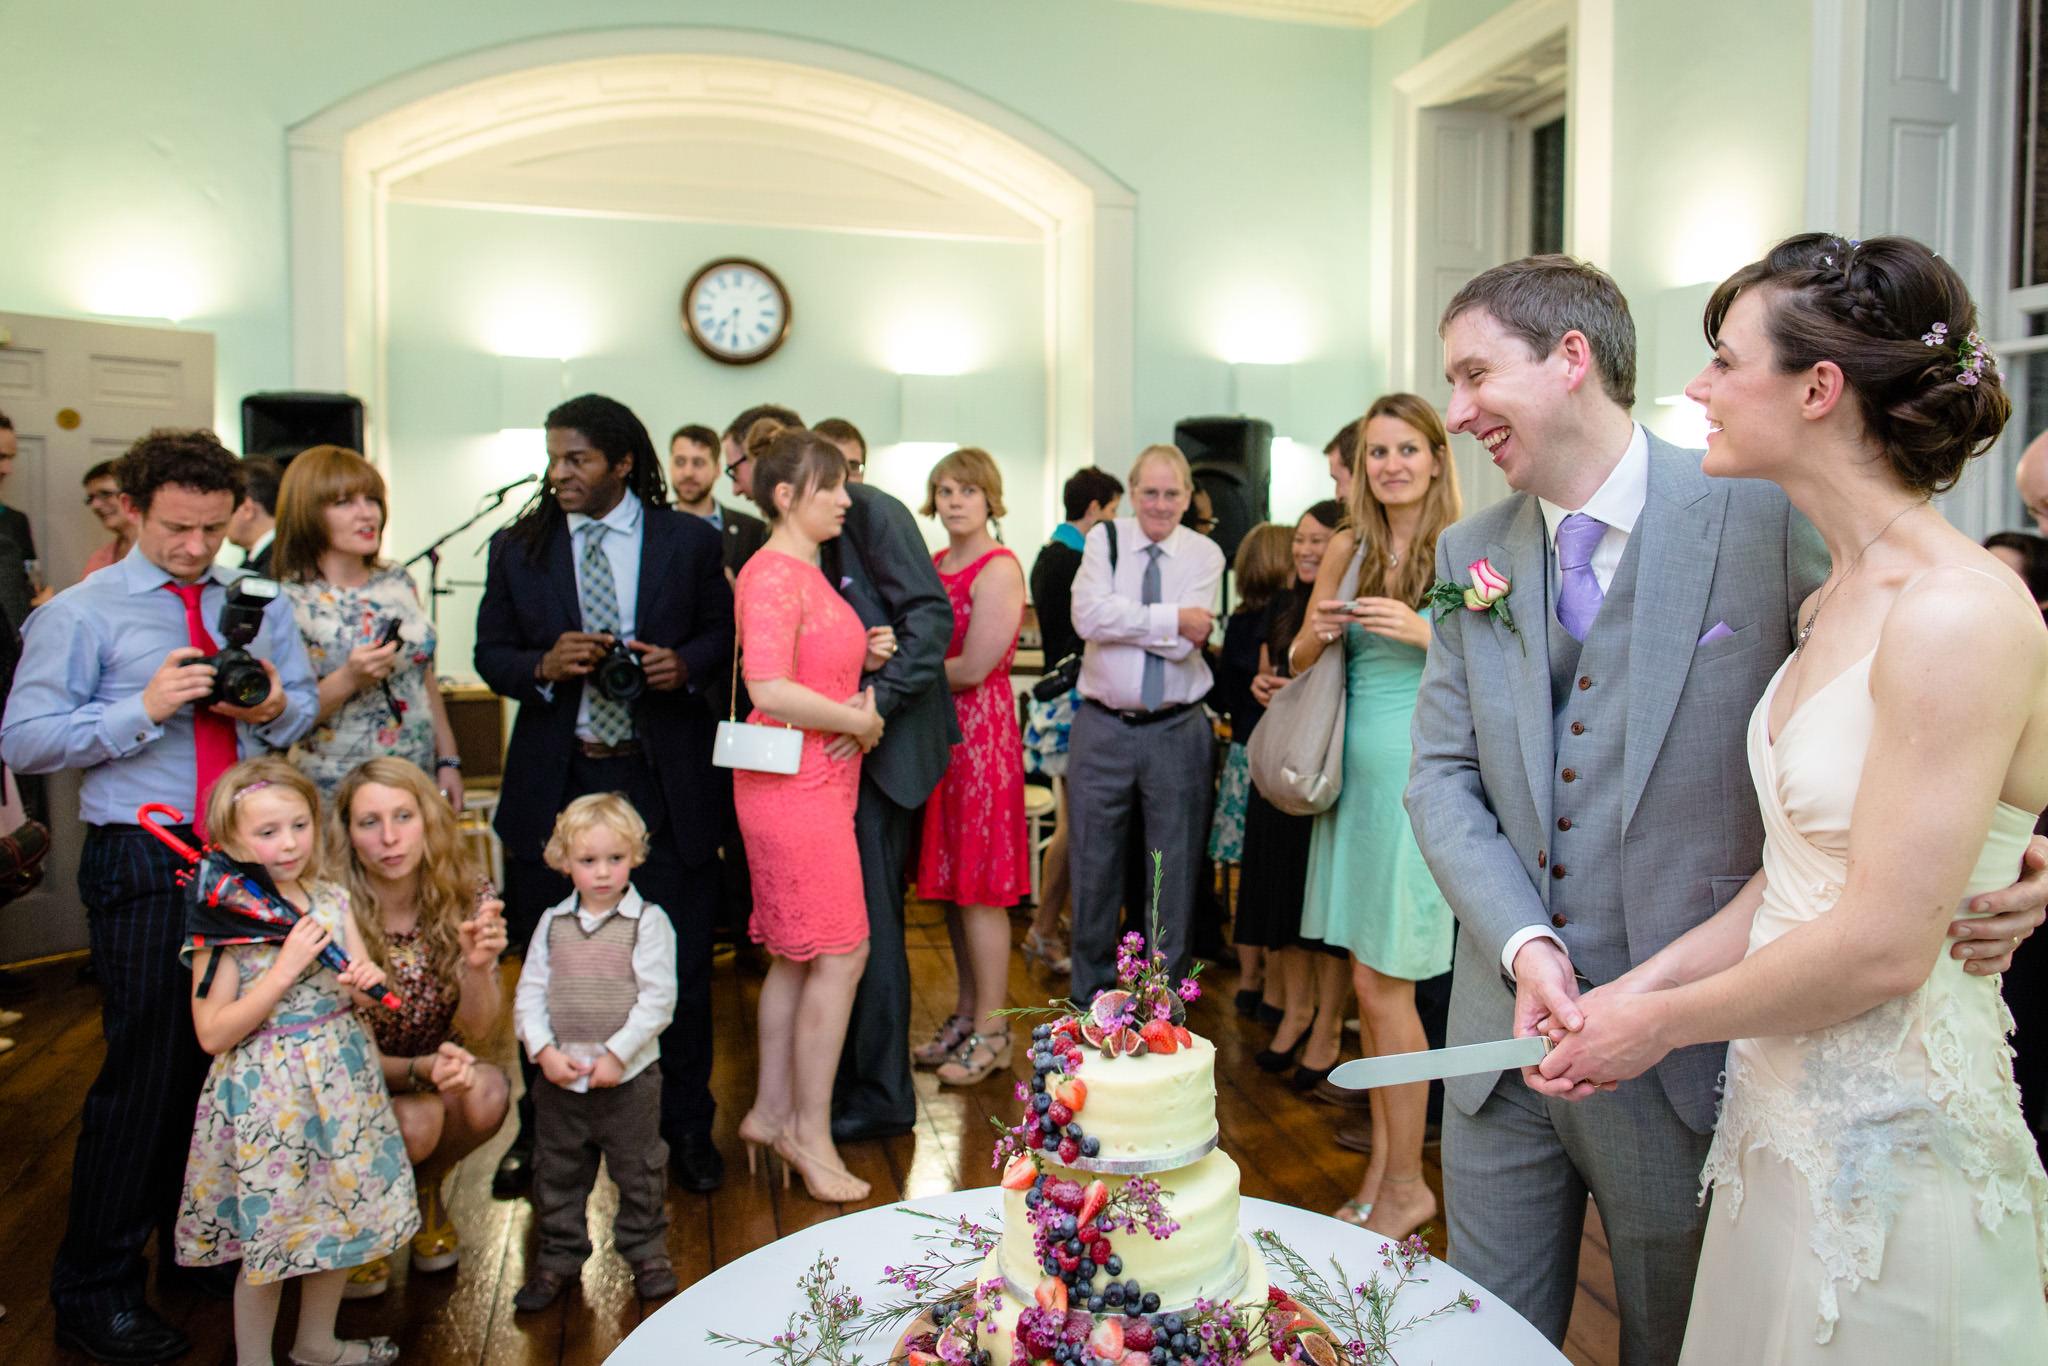 Clissold House wedding cake cutting